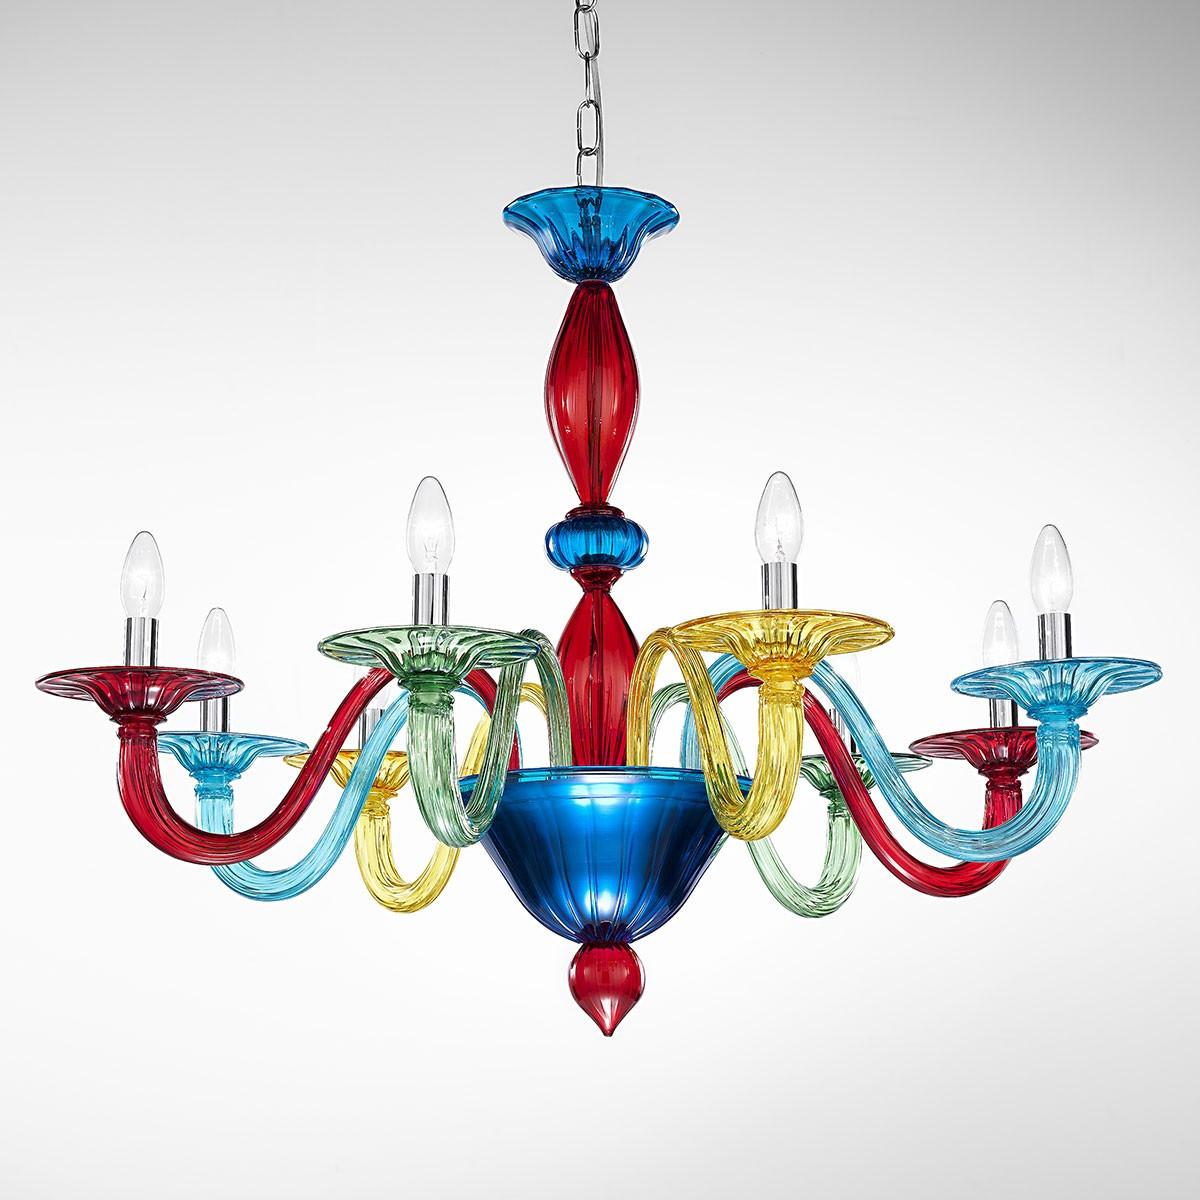 """Iride"" Murano glass chandelier - 8 lights - multicolor"